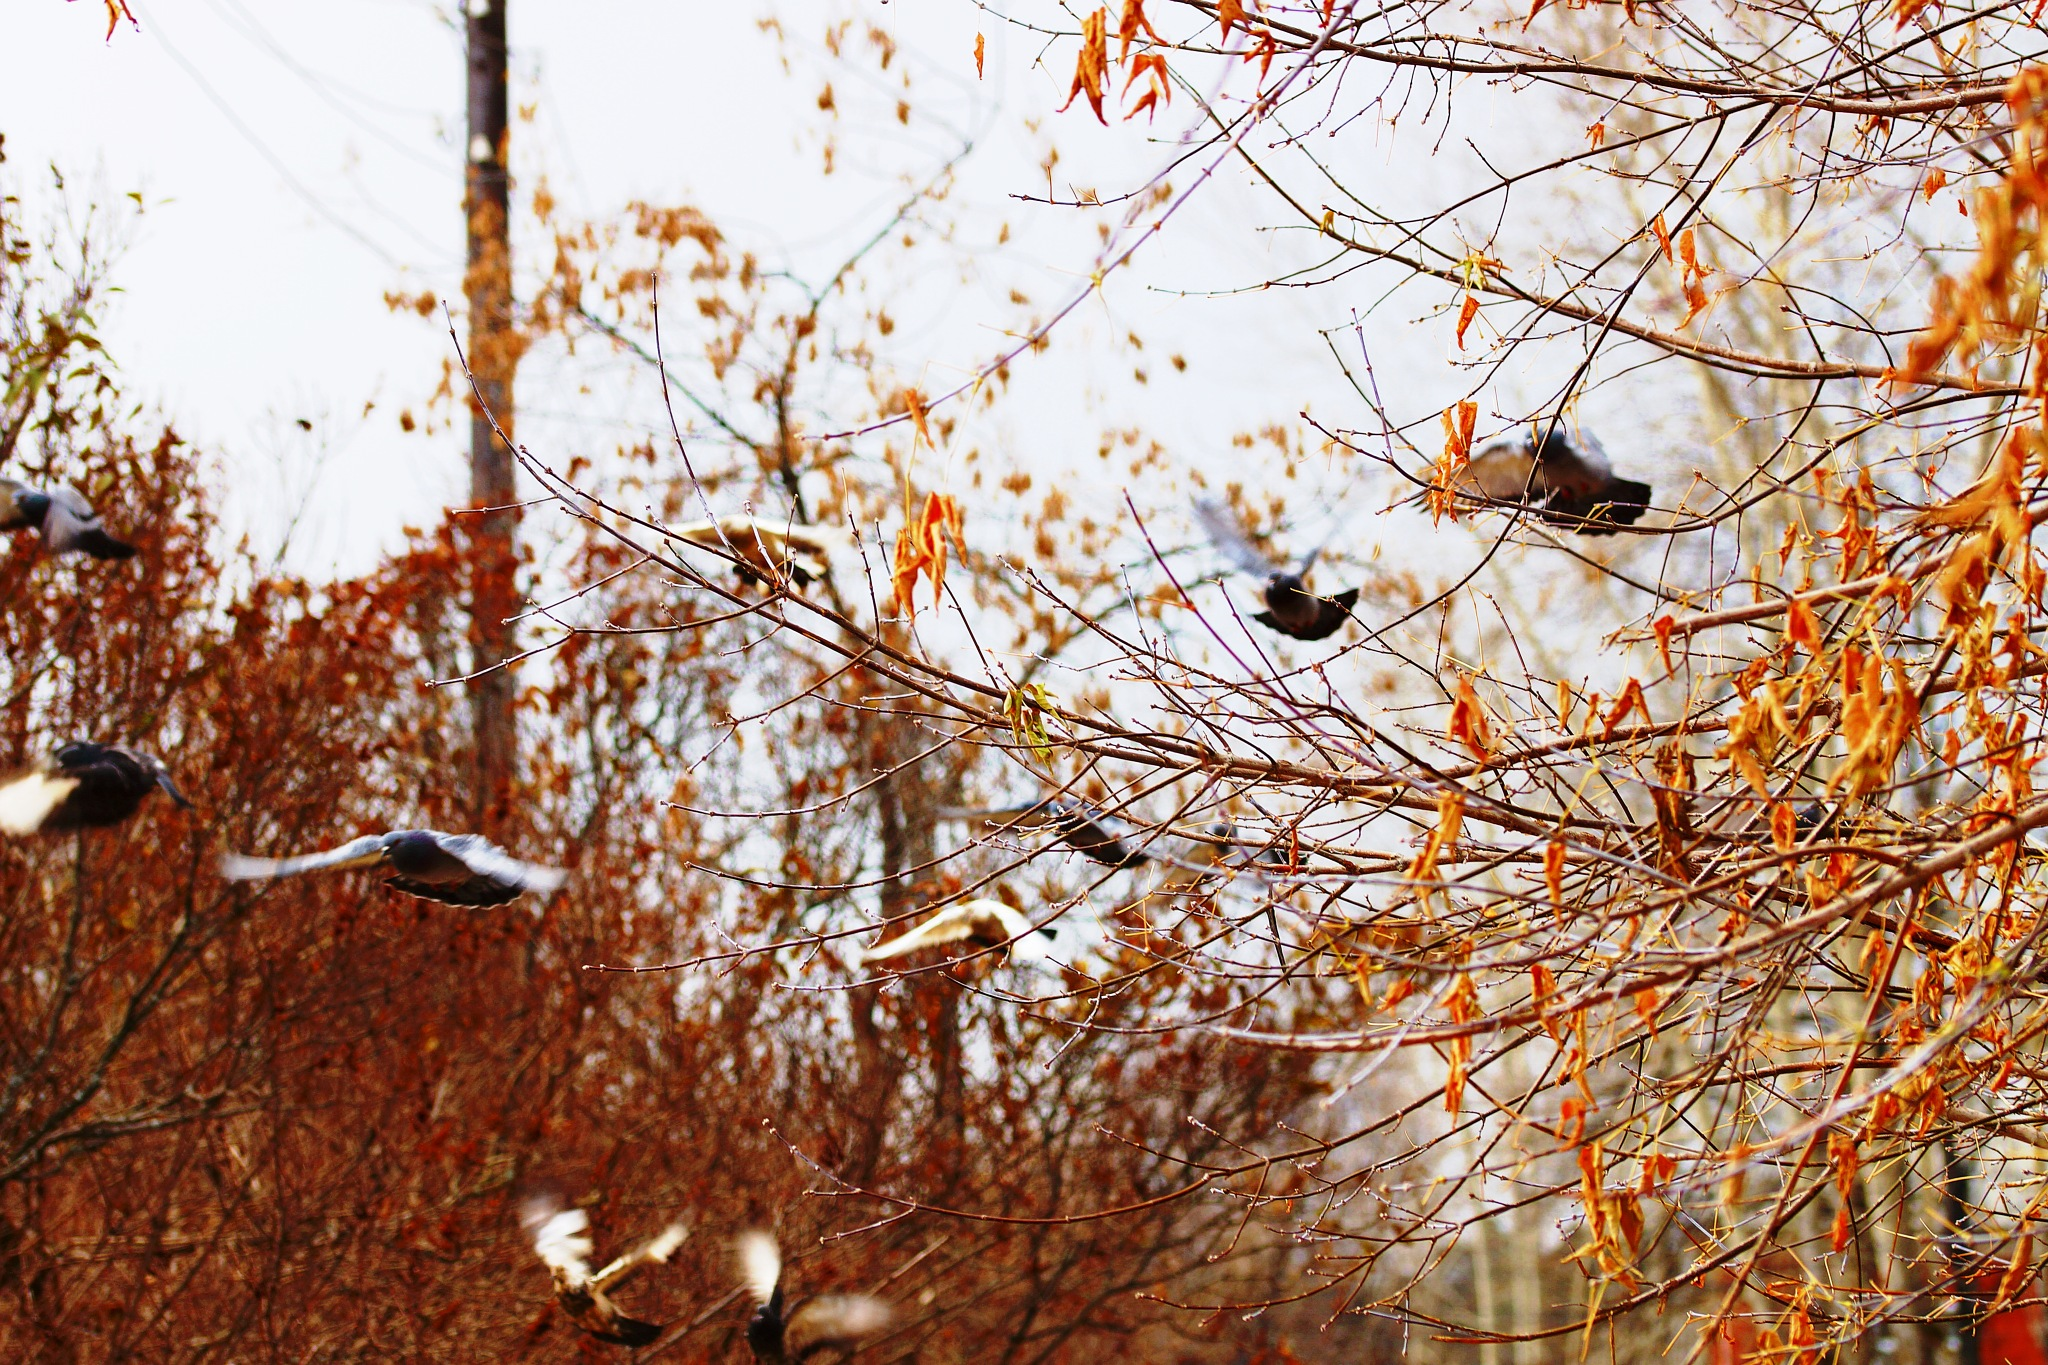 Autumn movements  by sergey.parfeniuk